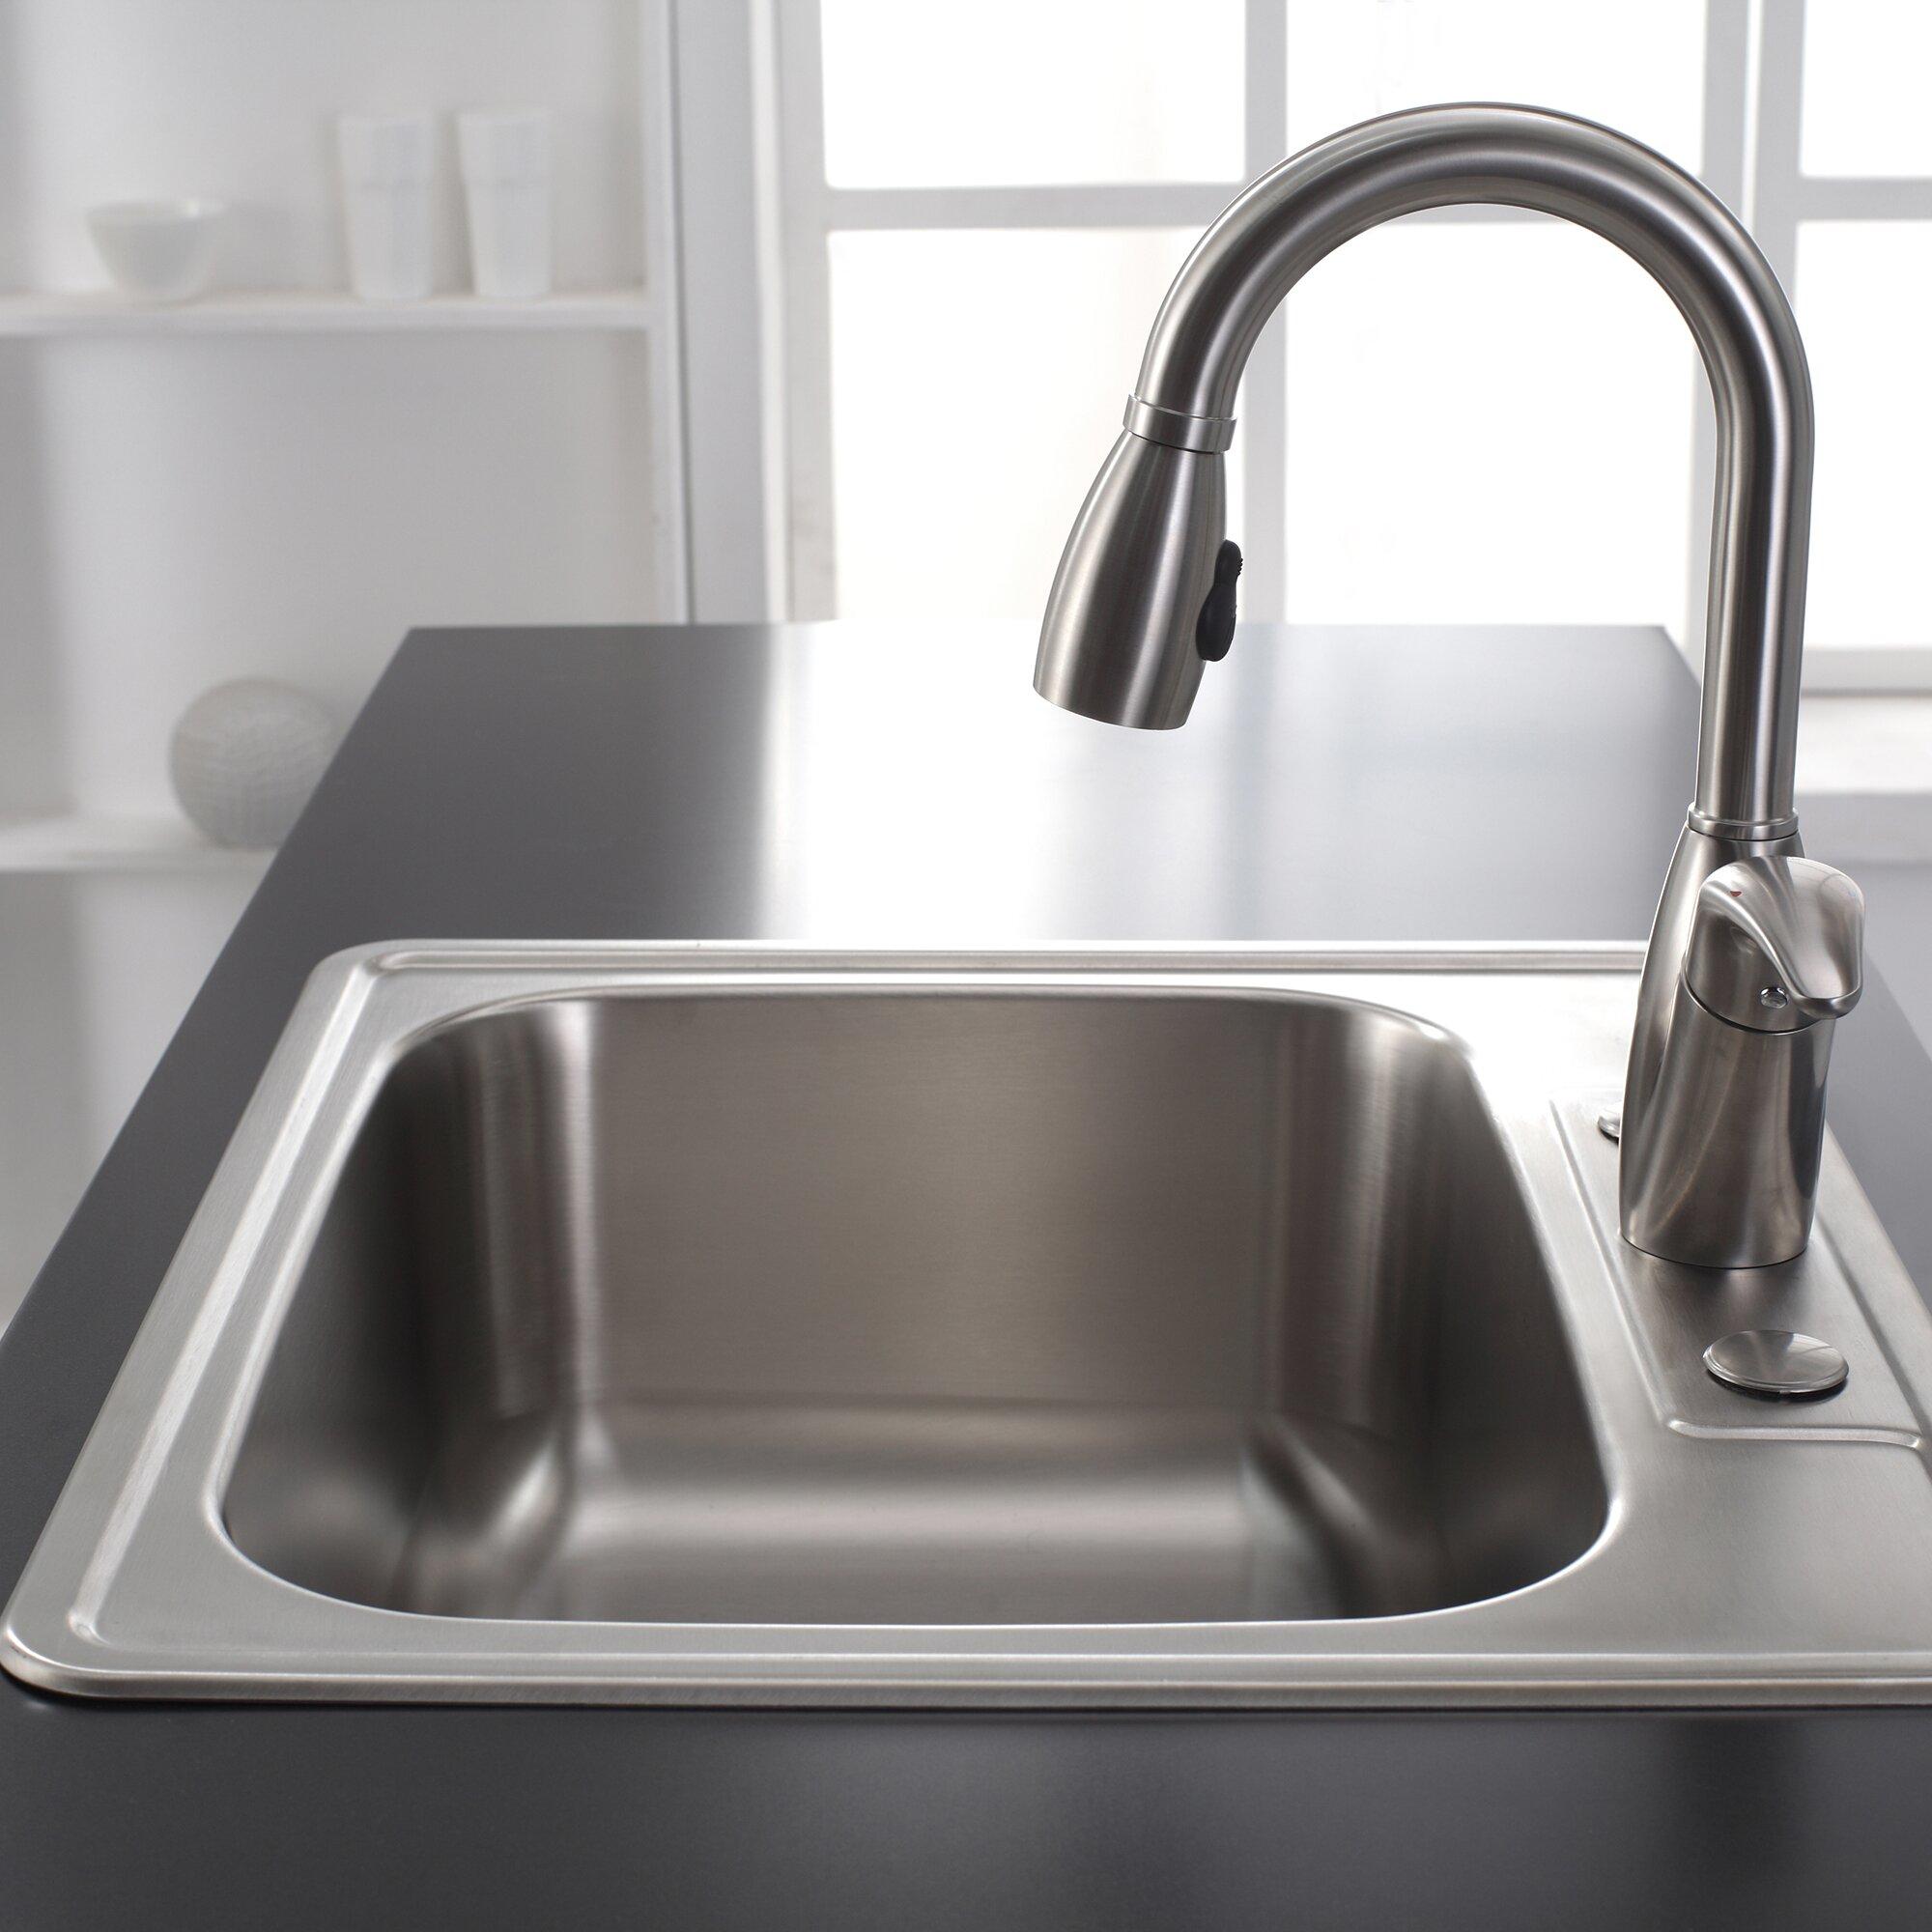 Kraus Kitchen Sink Reviews : Kraus 25